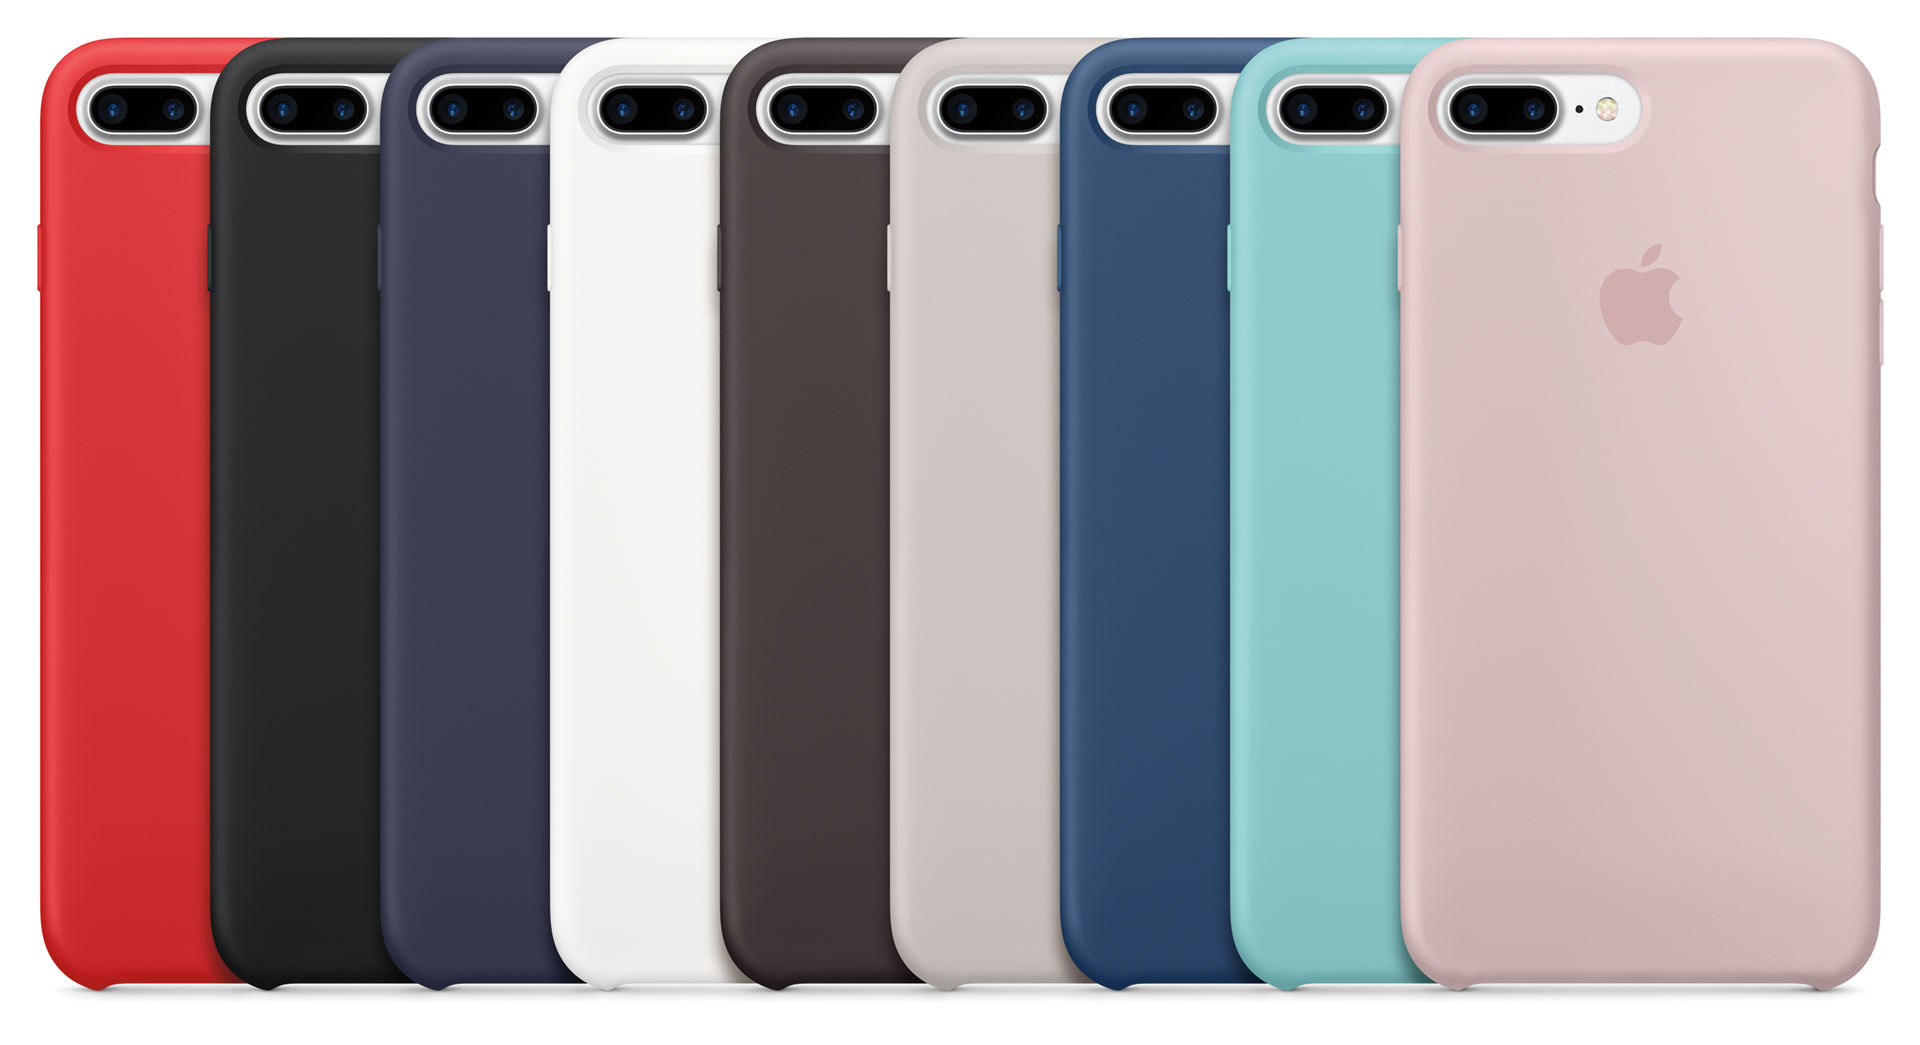 big sale fb4f2 e96a4 Apple iPhone 7 & 7 Plus | Airpods, No Headphone Jack, Black Color ...